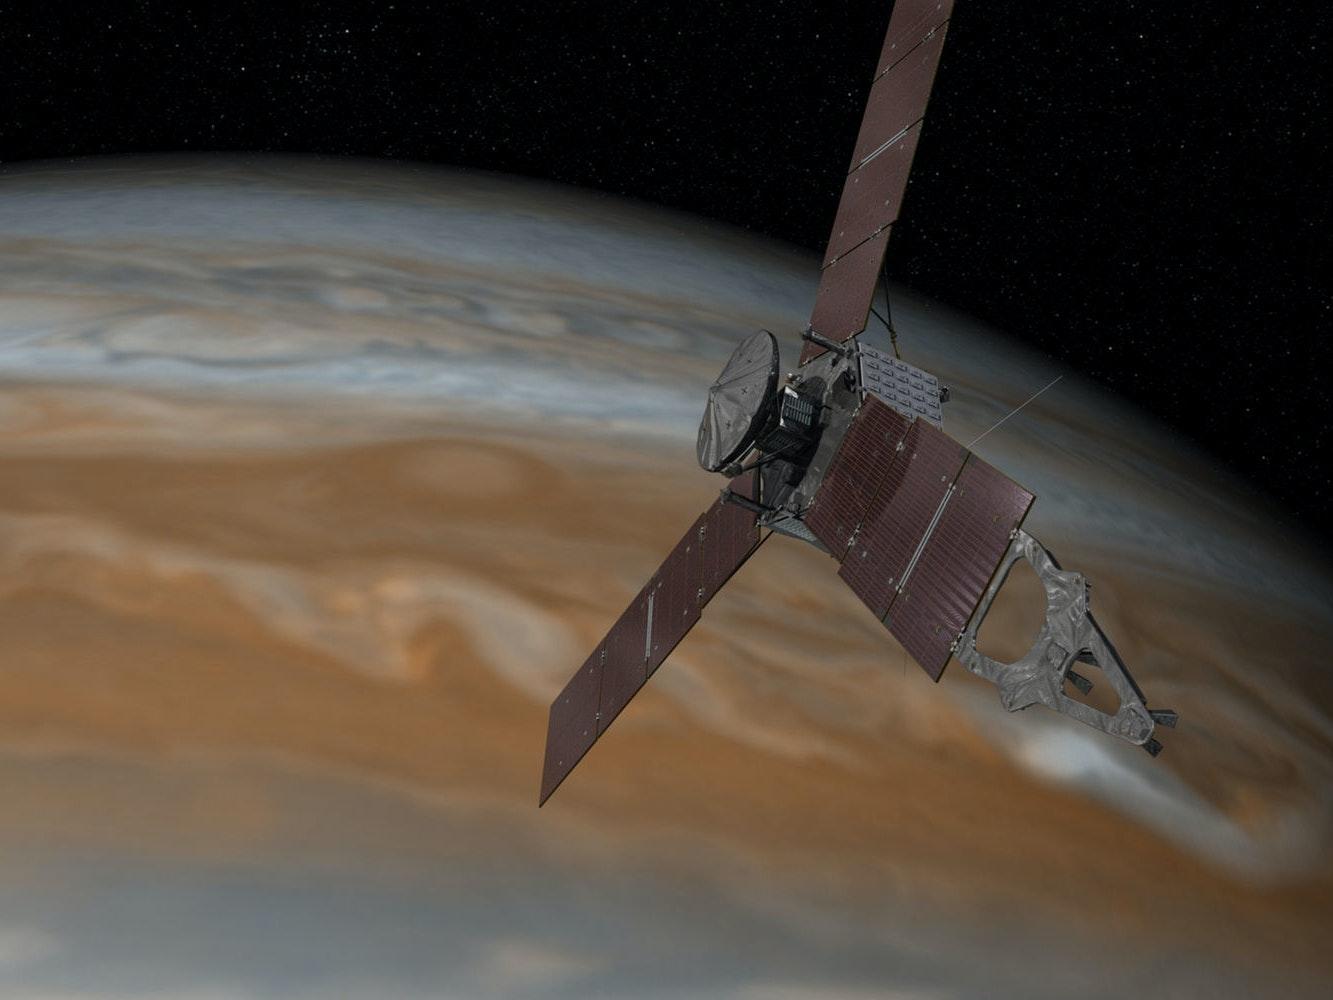 NASA's Juno Spacecraft Preps for Third Science Orbit